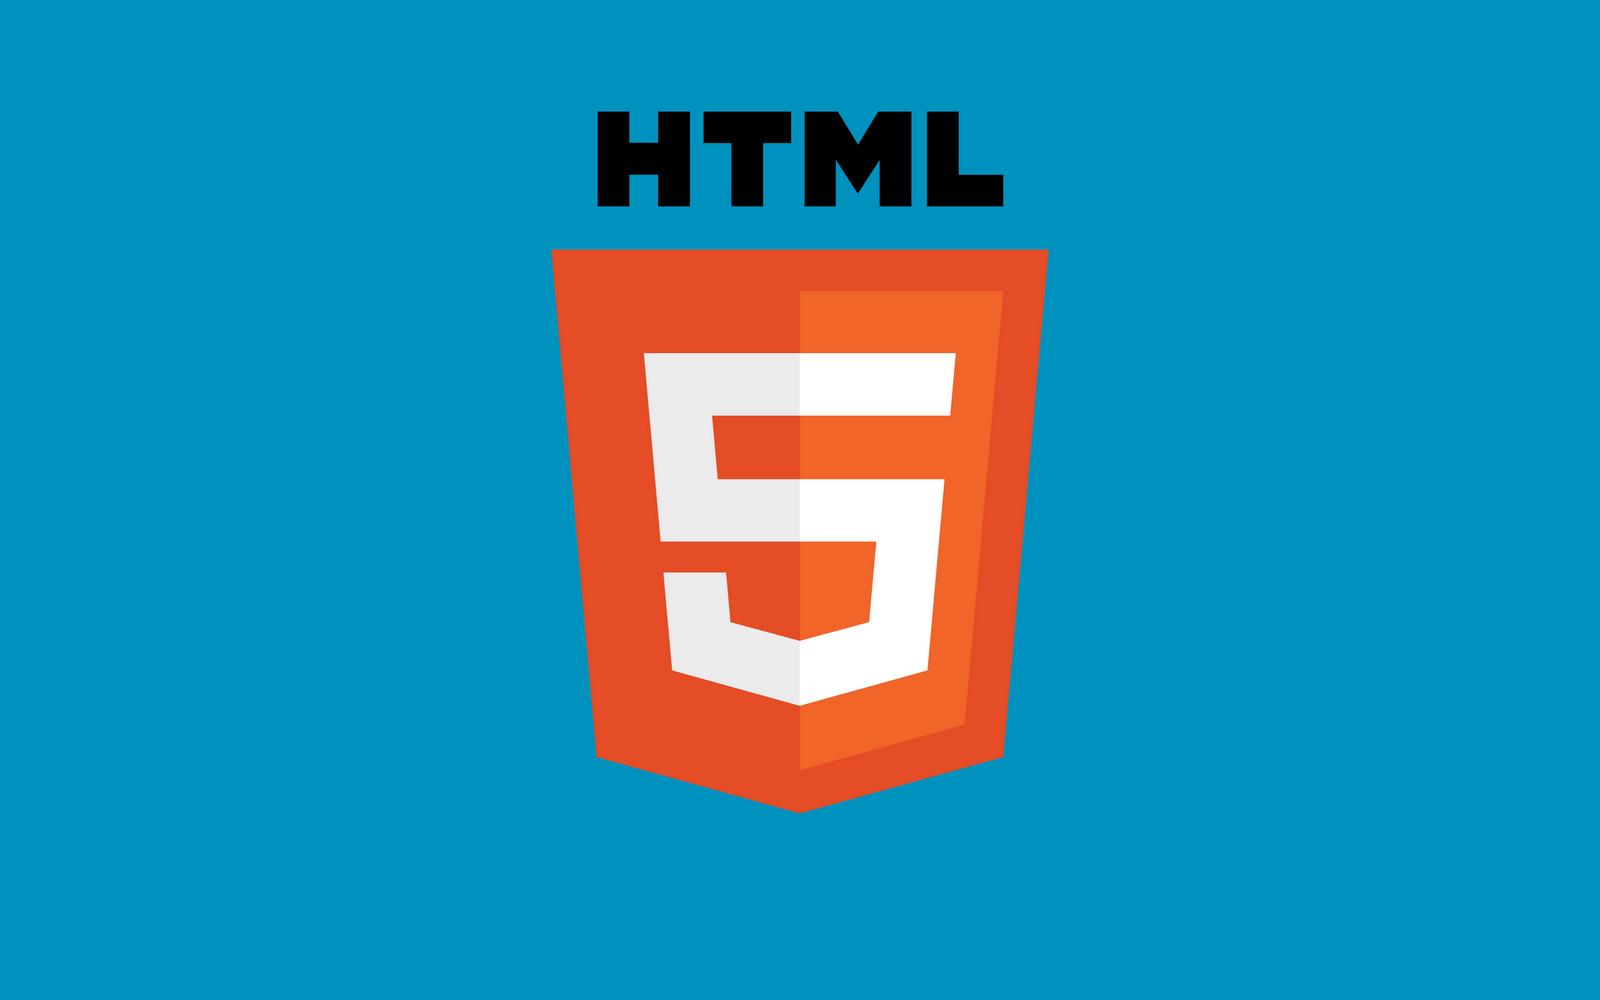 3d photo gallery html5 W3C HTML 5 Logo - World Wide Web Consortium (W3C)